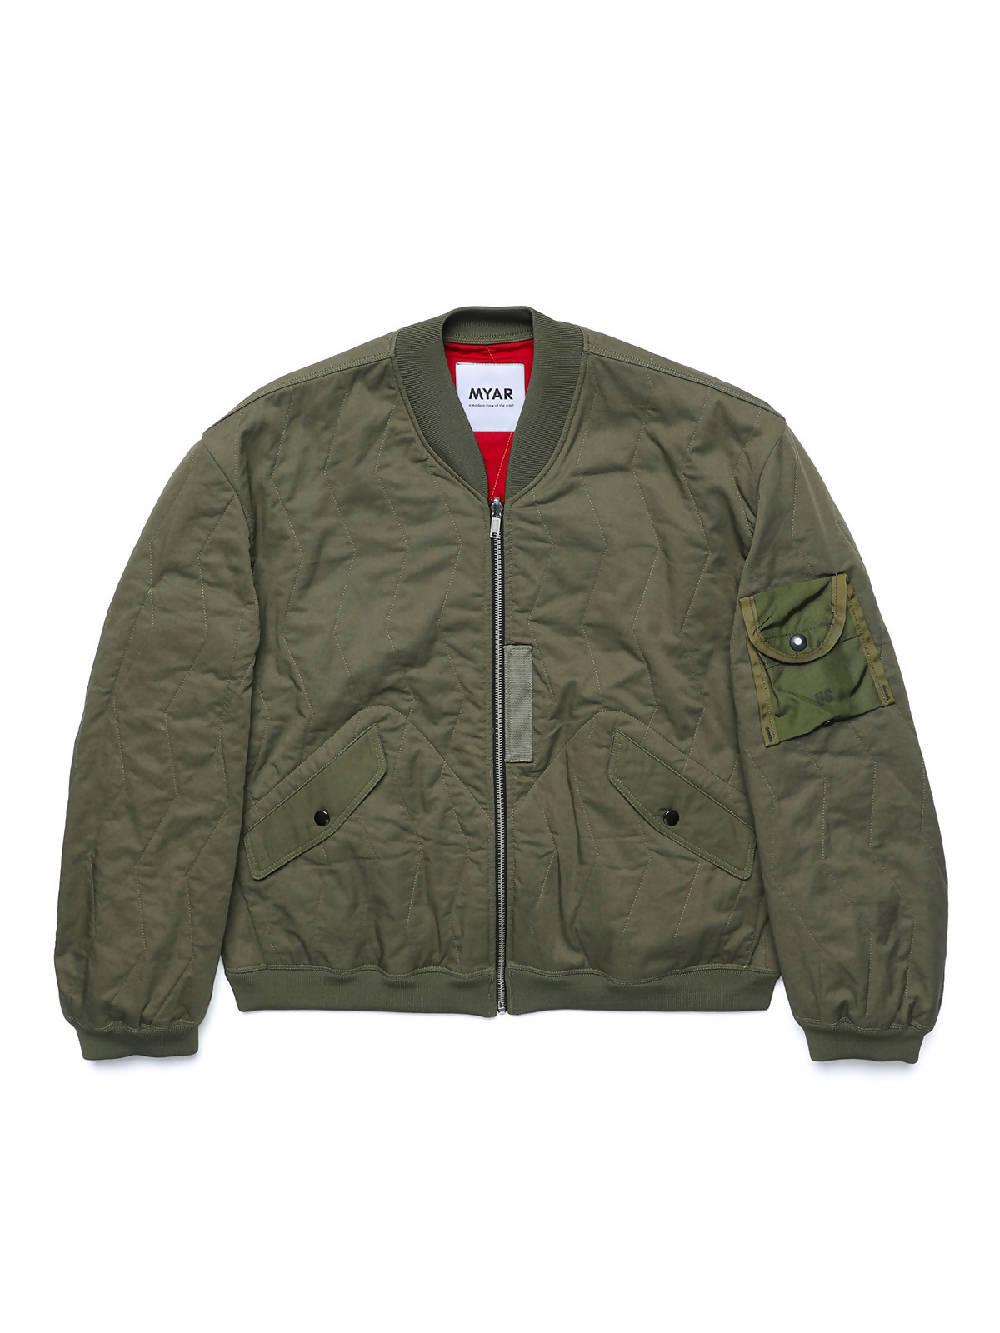 MYAR MYJC12 Reversible Green Flying Jacket